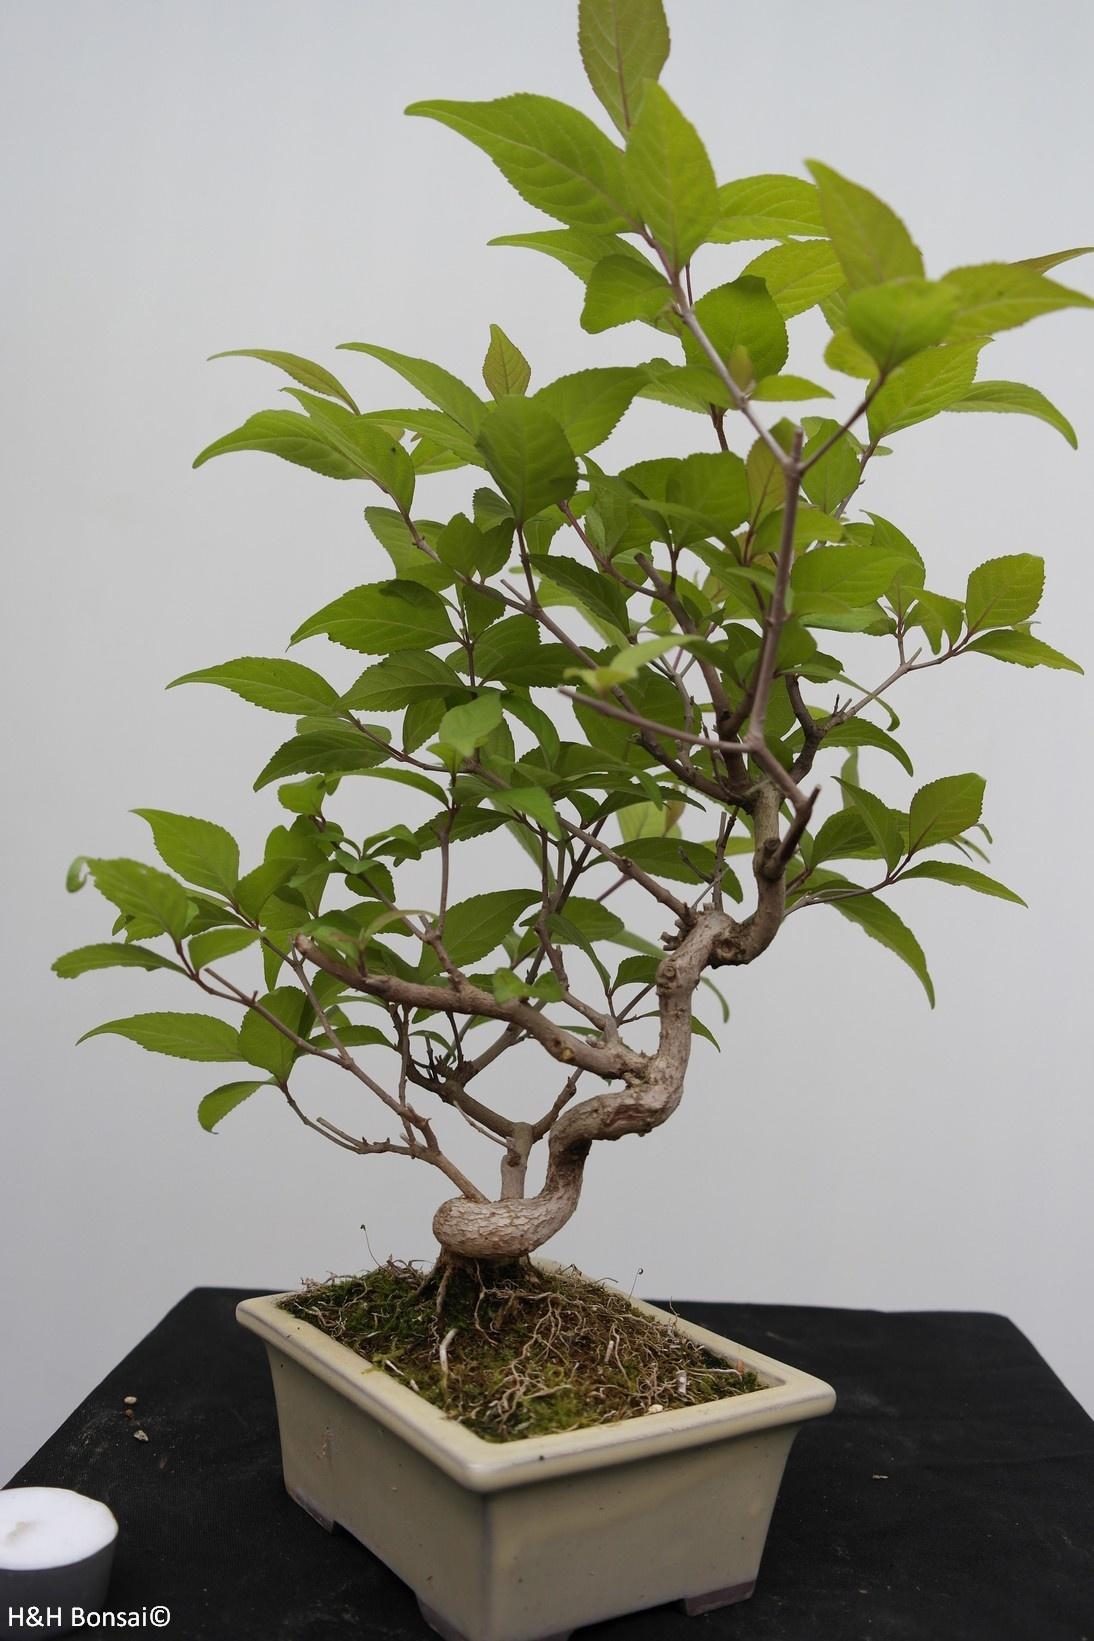 Bonsai Liebesperlenstrauch, Callicarpa japonica, nr. 7783